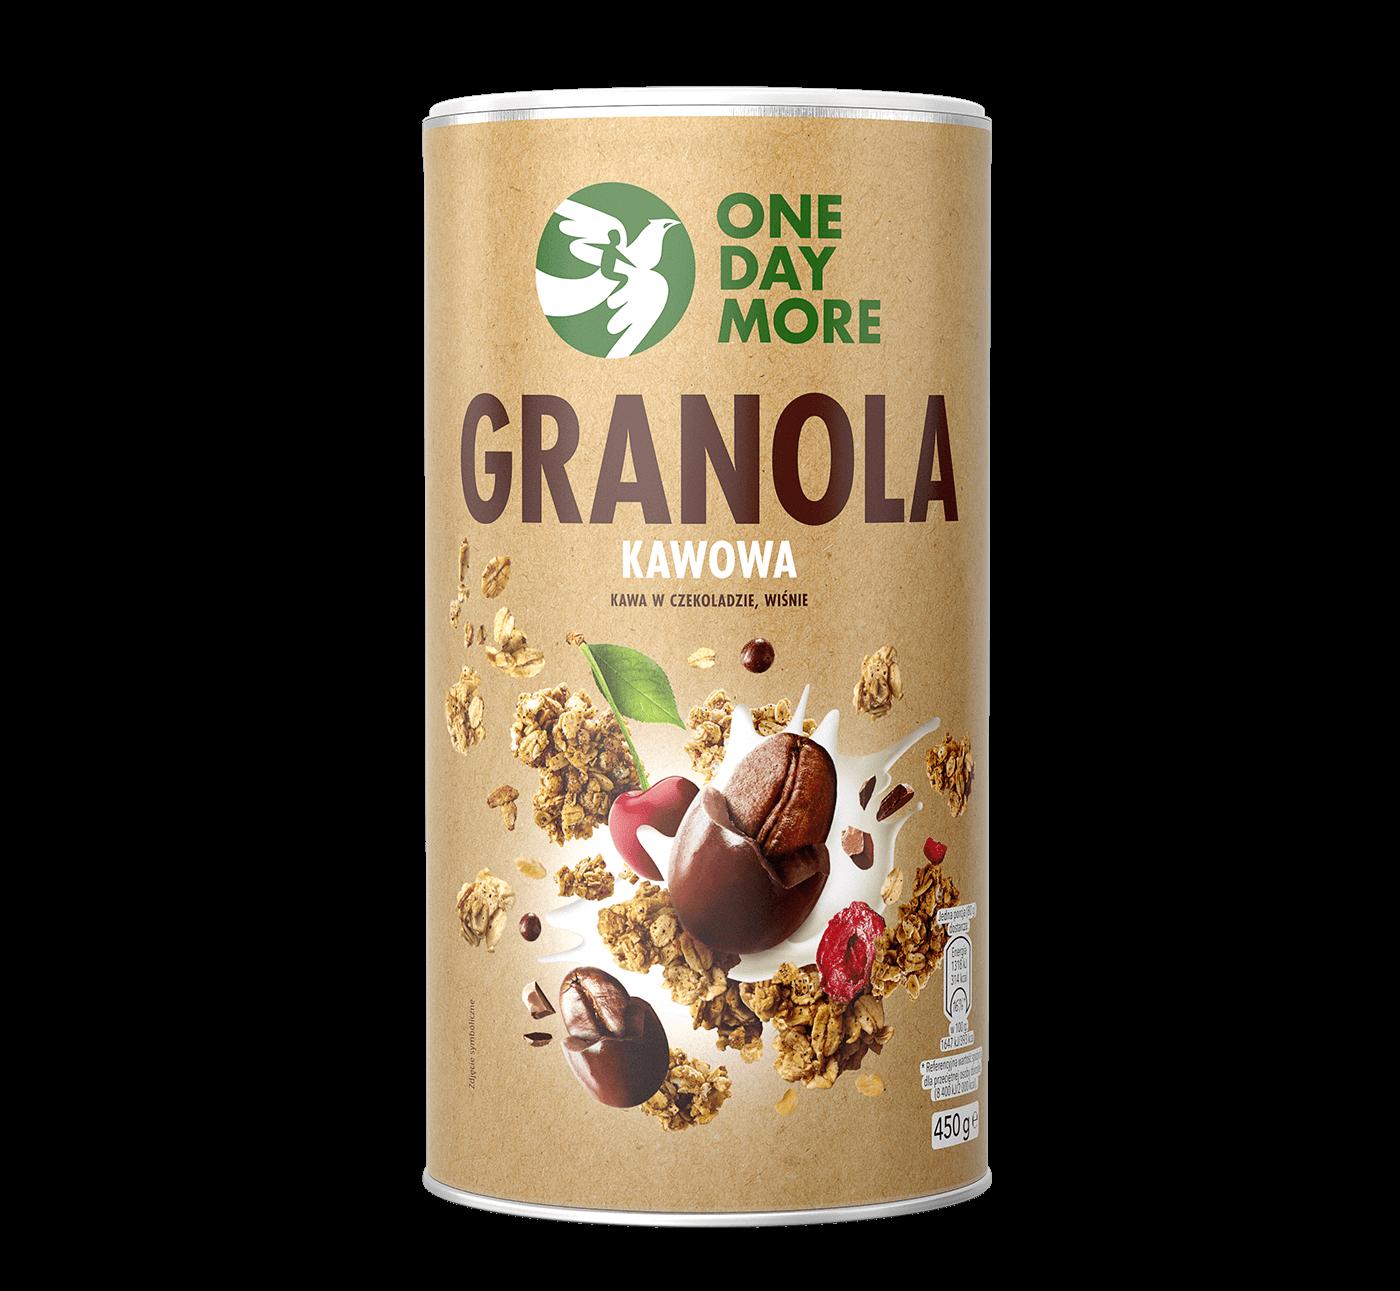 granola-kawowa-onedaymore-tuba-1400x1291_1